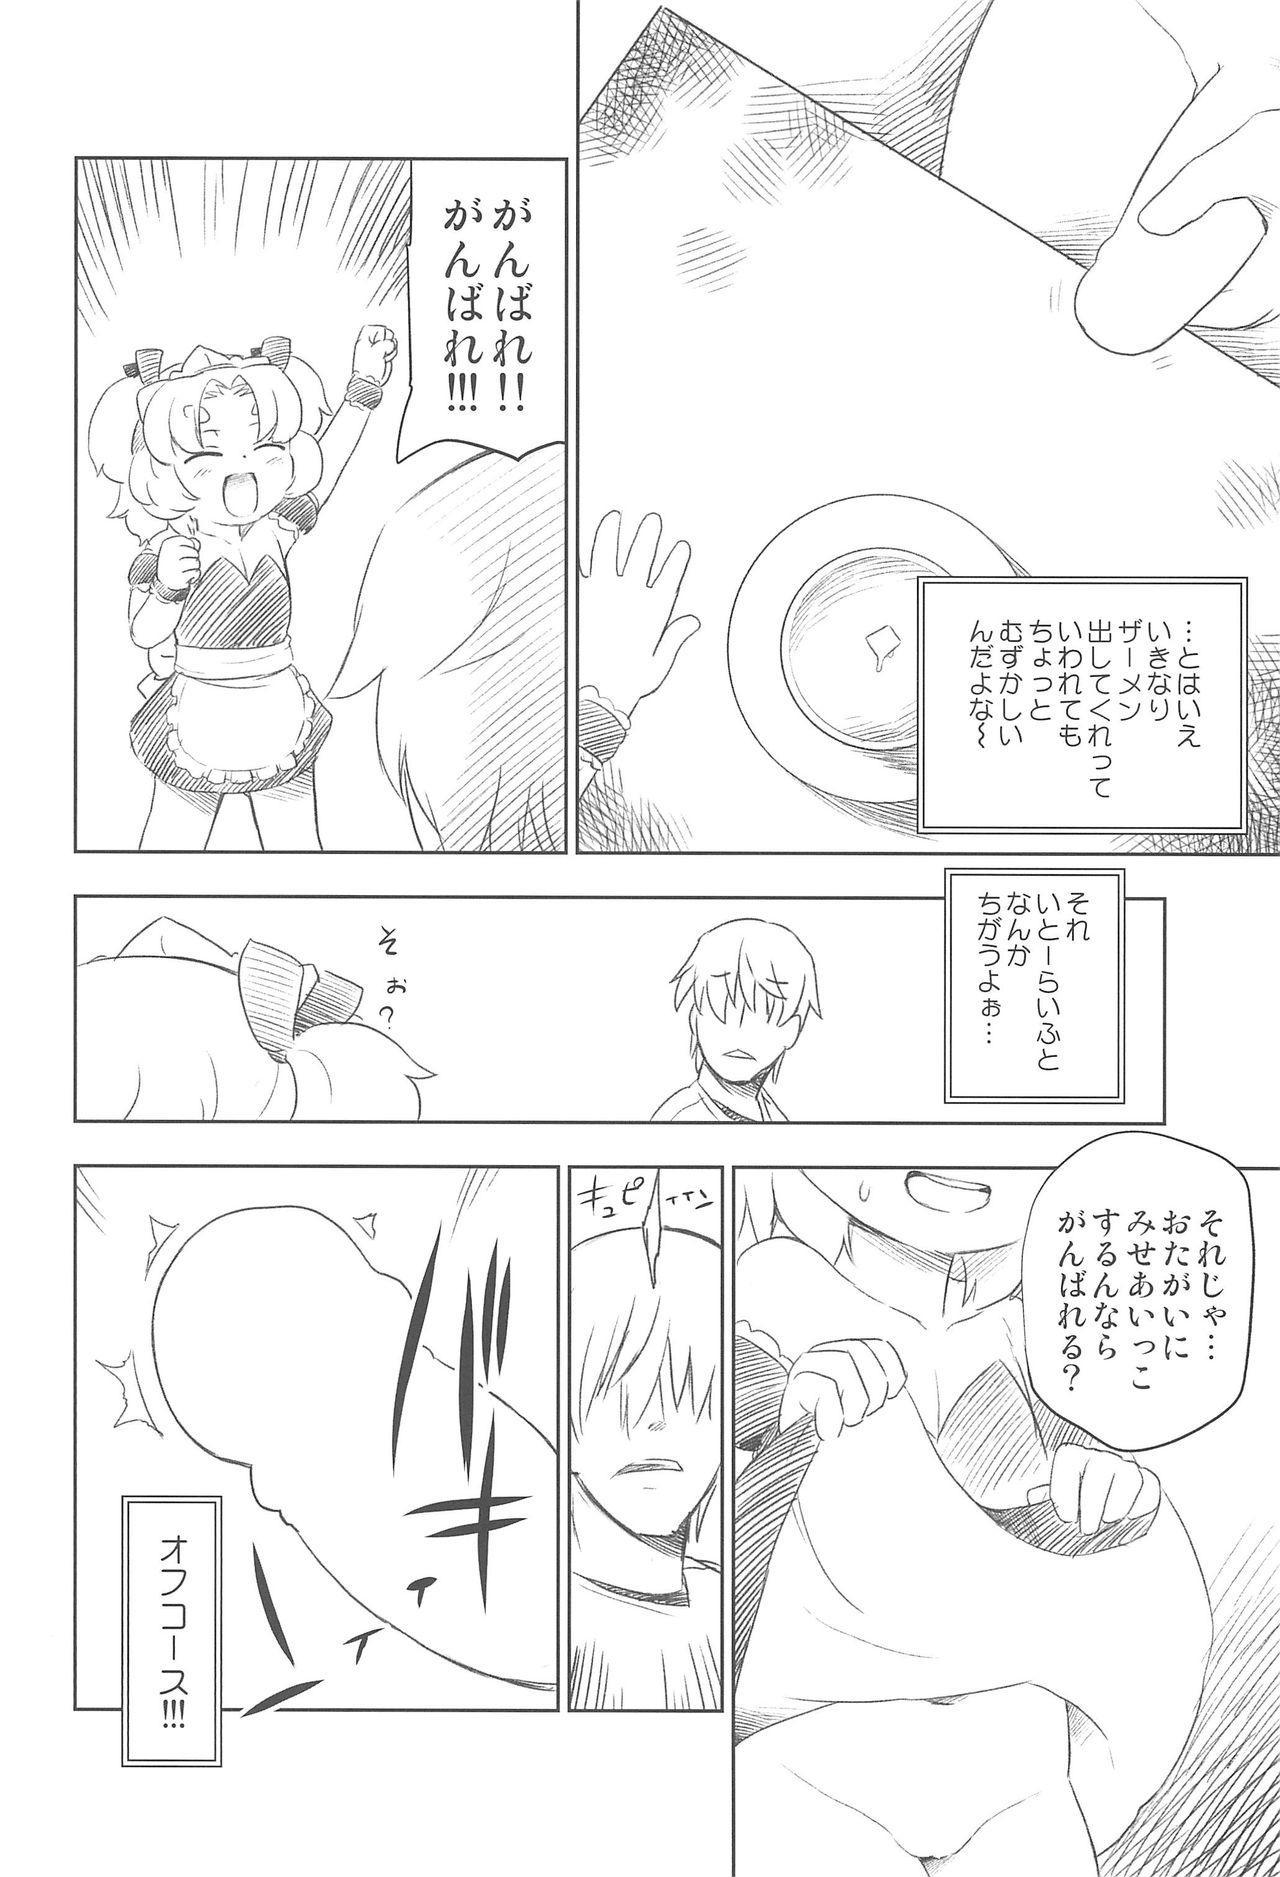 Petit Dolls VOL. 9 Creampie-san Torotoro Amaai Nakadashi Girl 7